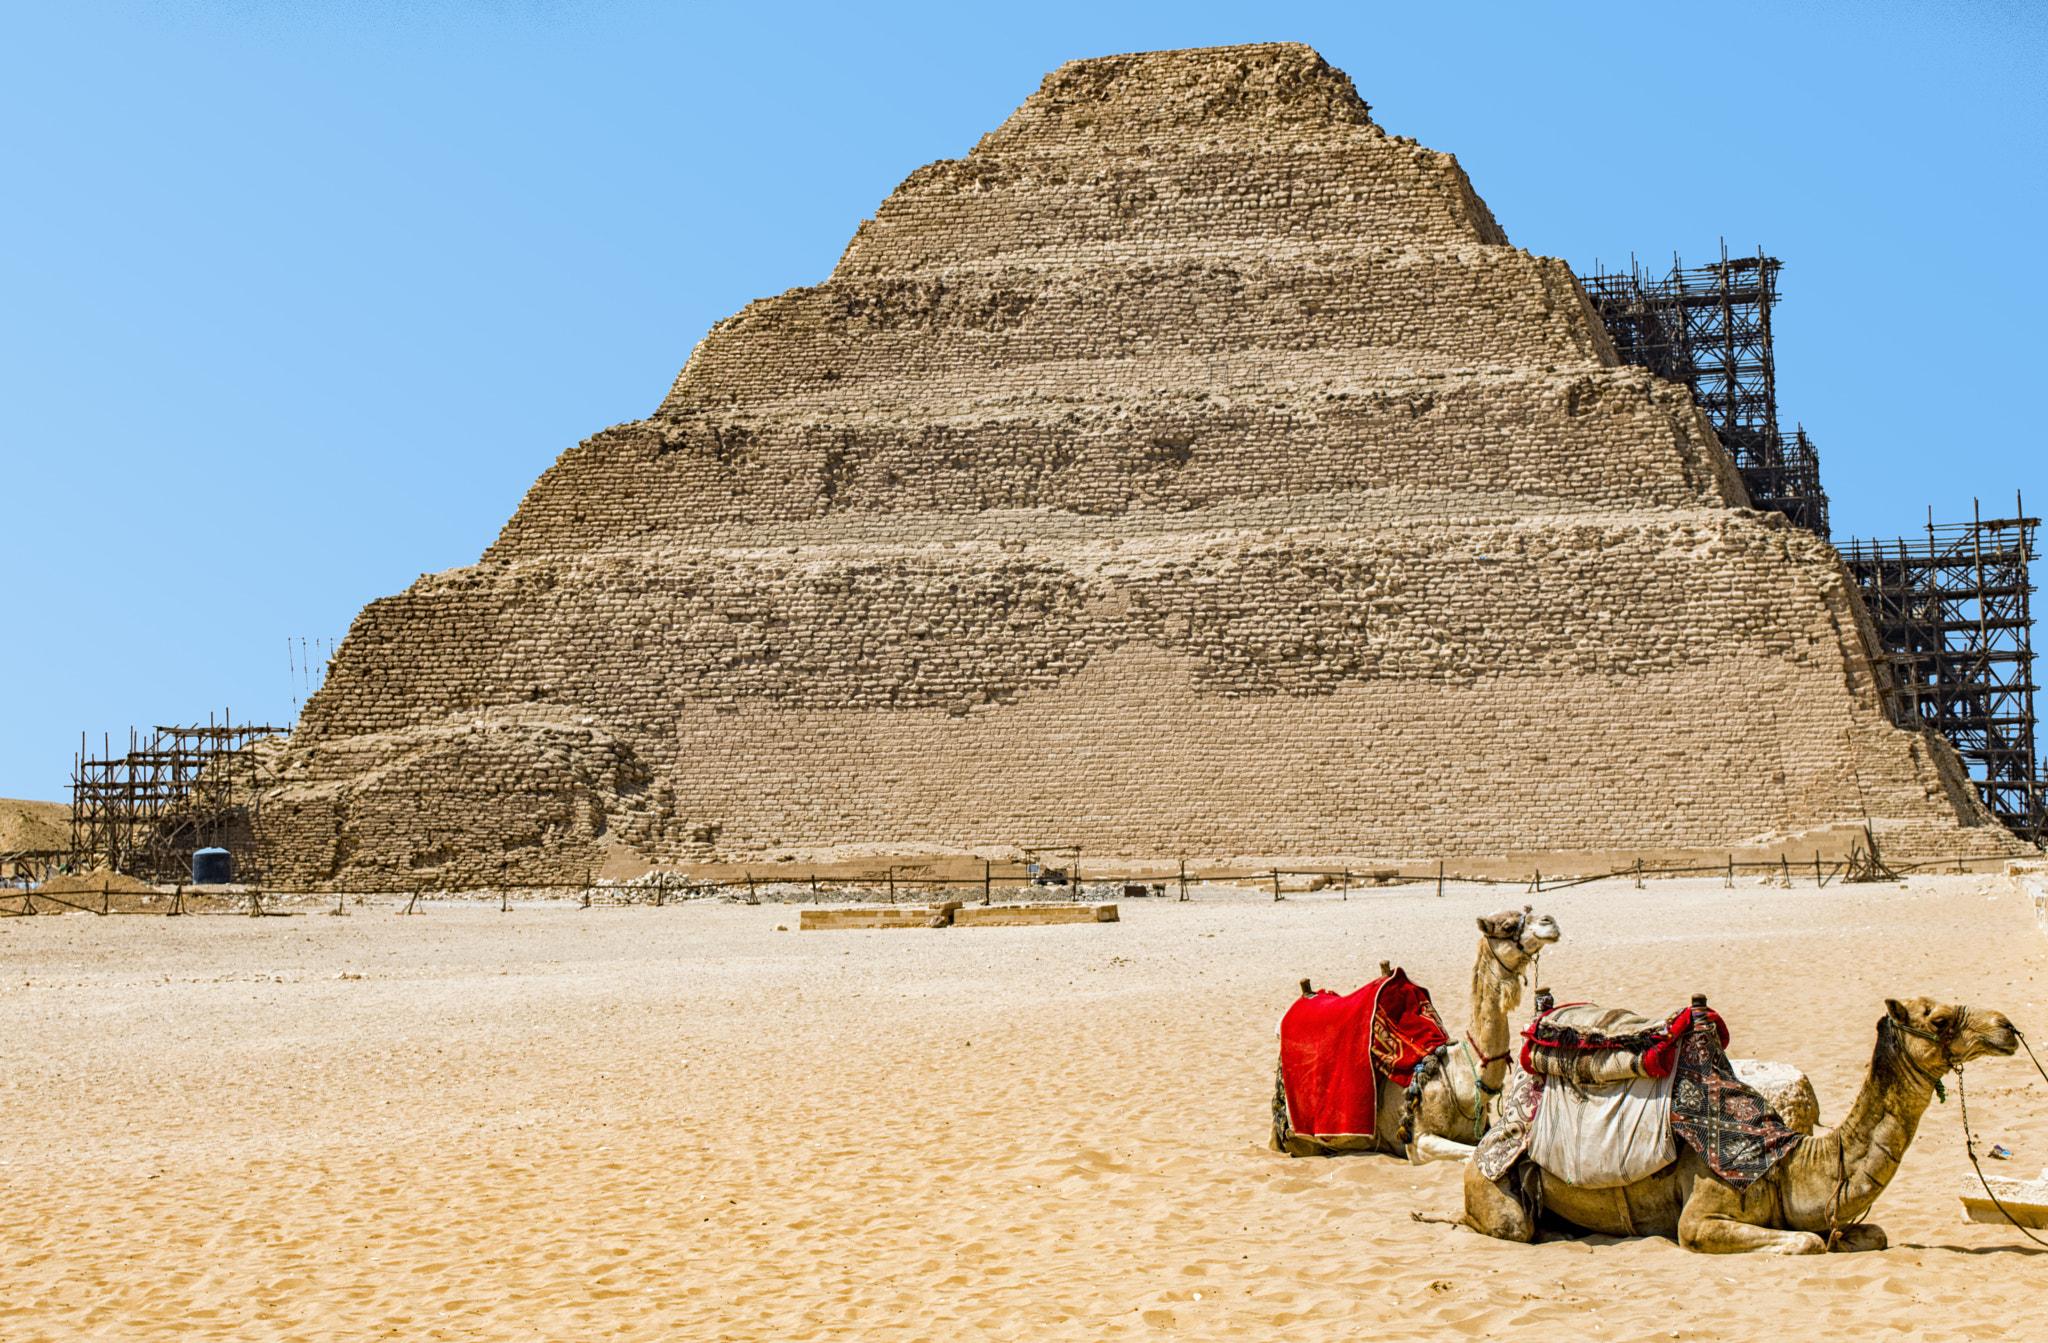 Stepped_Pyramid_Of_Sakkara_(235168869)